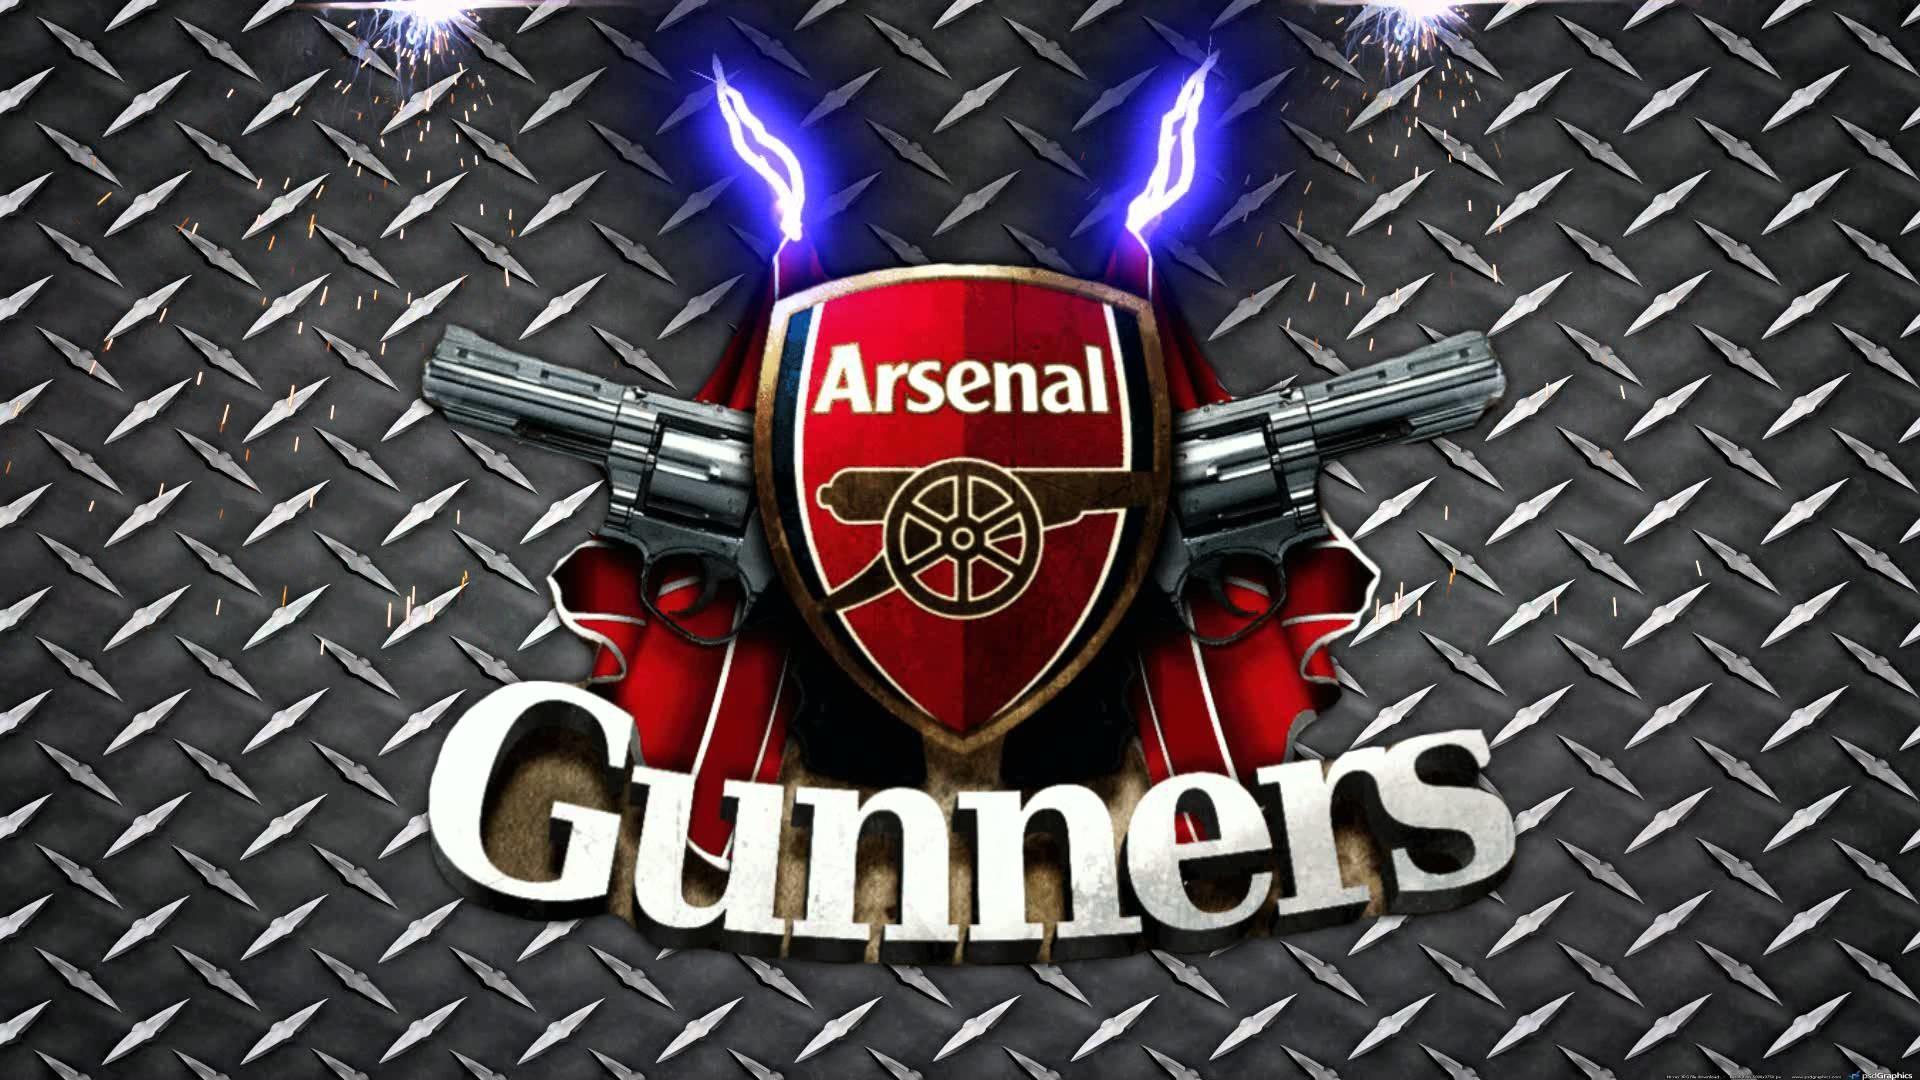 Arsenal: Arsenal Wallpaper HD ·① WallpaperTag